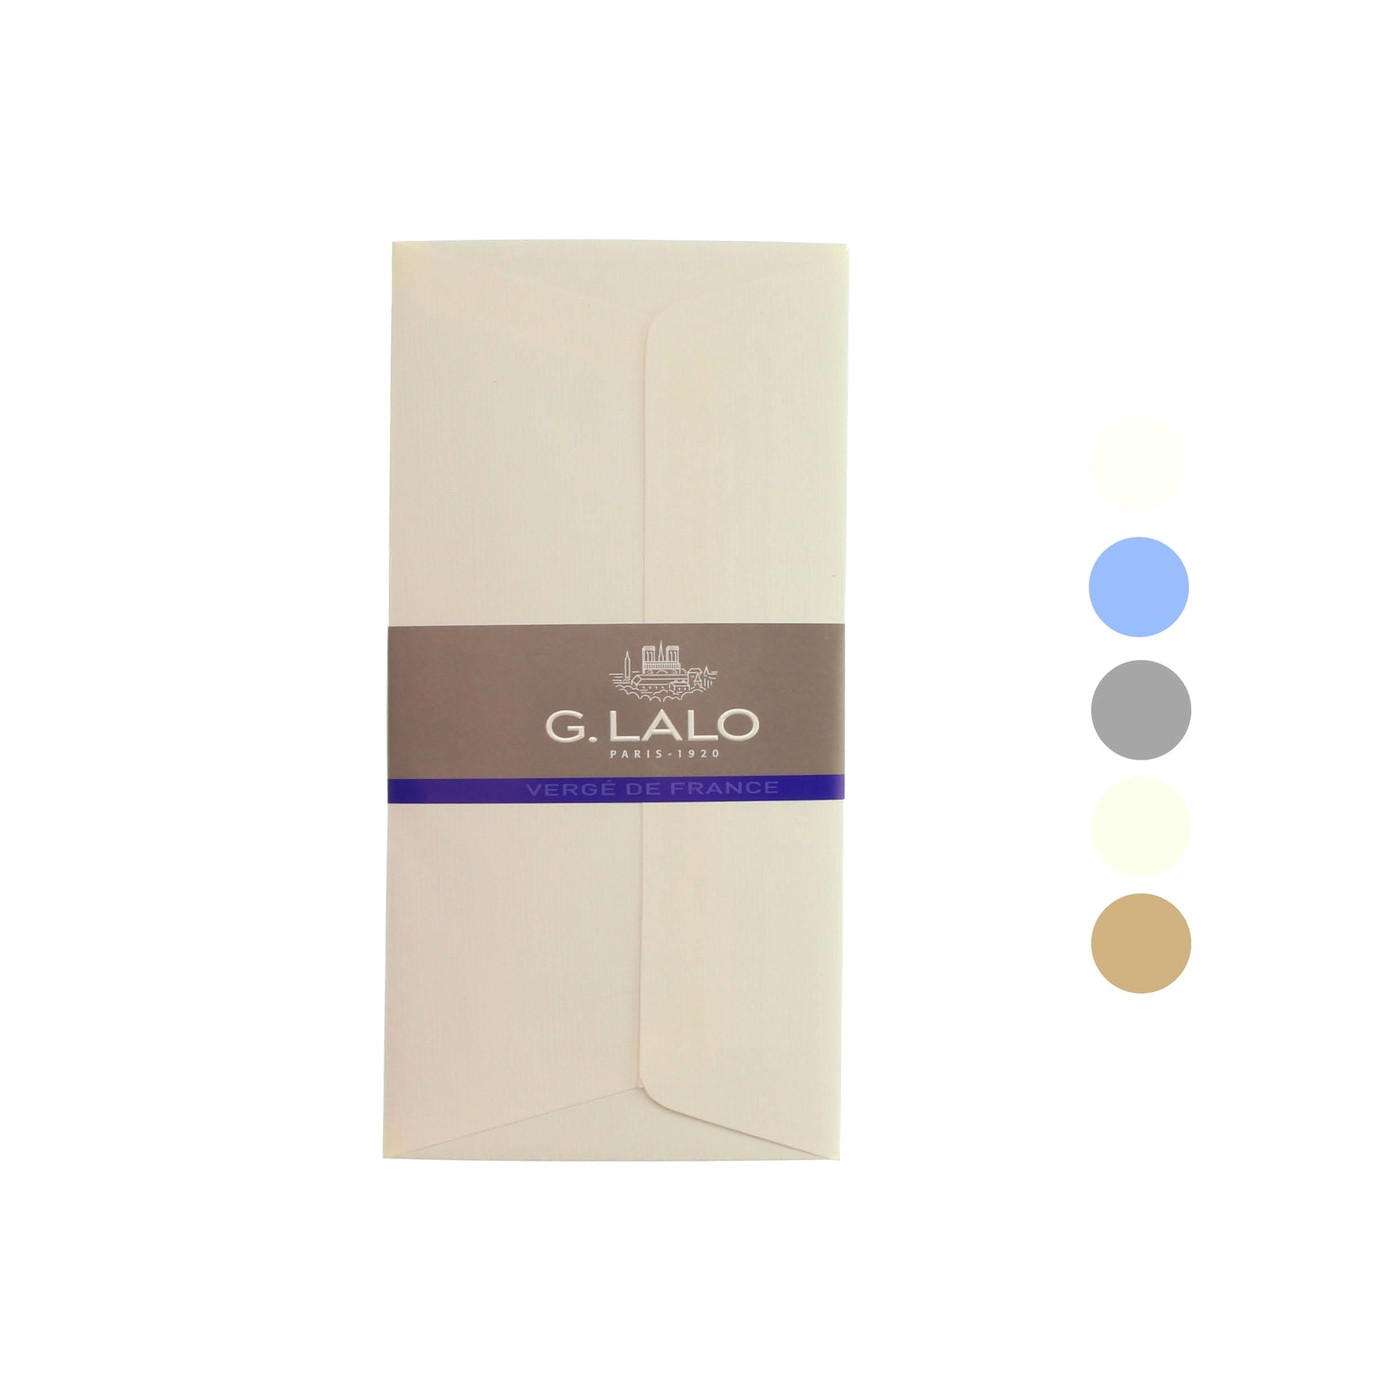 G Lalo Verge de France envelopes - DL